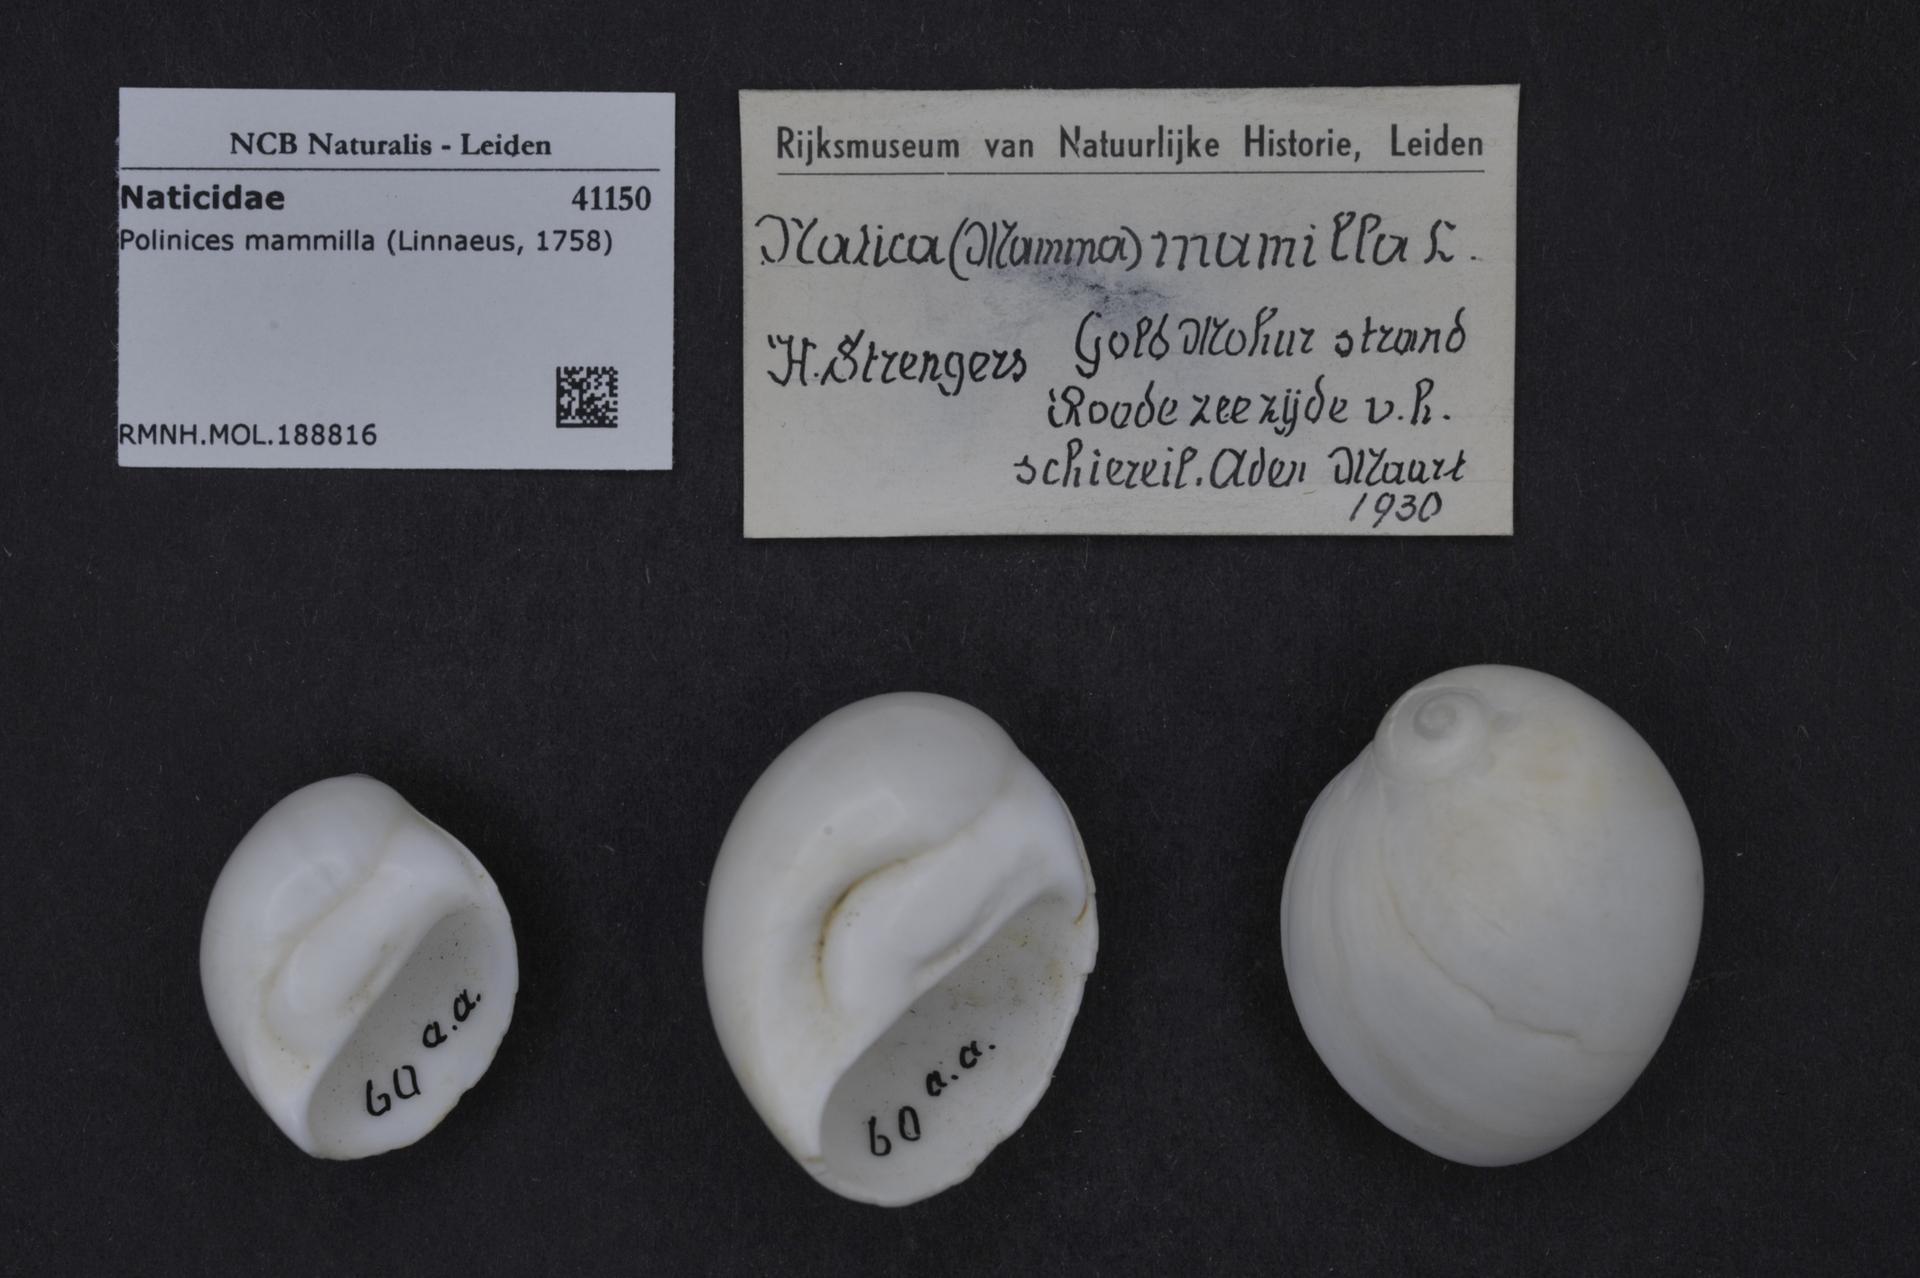 RMNH.MOL.188816 | Polinices mammilla Linnaeus, 1758